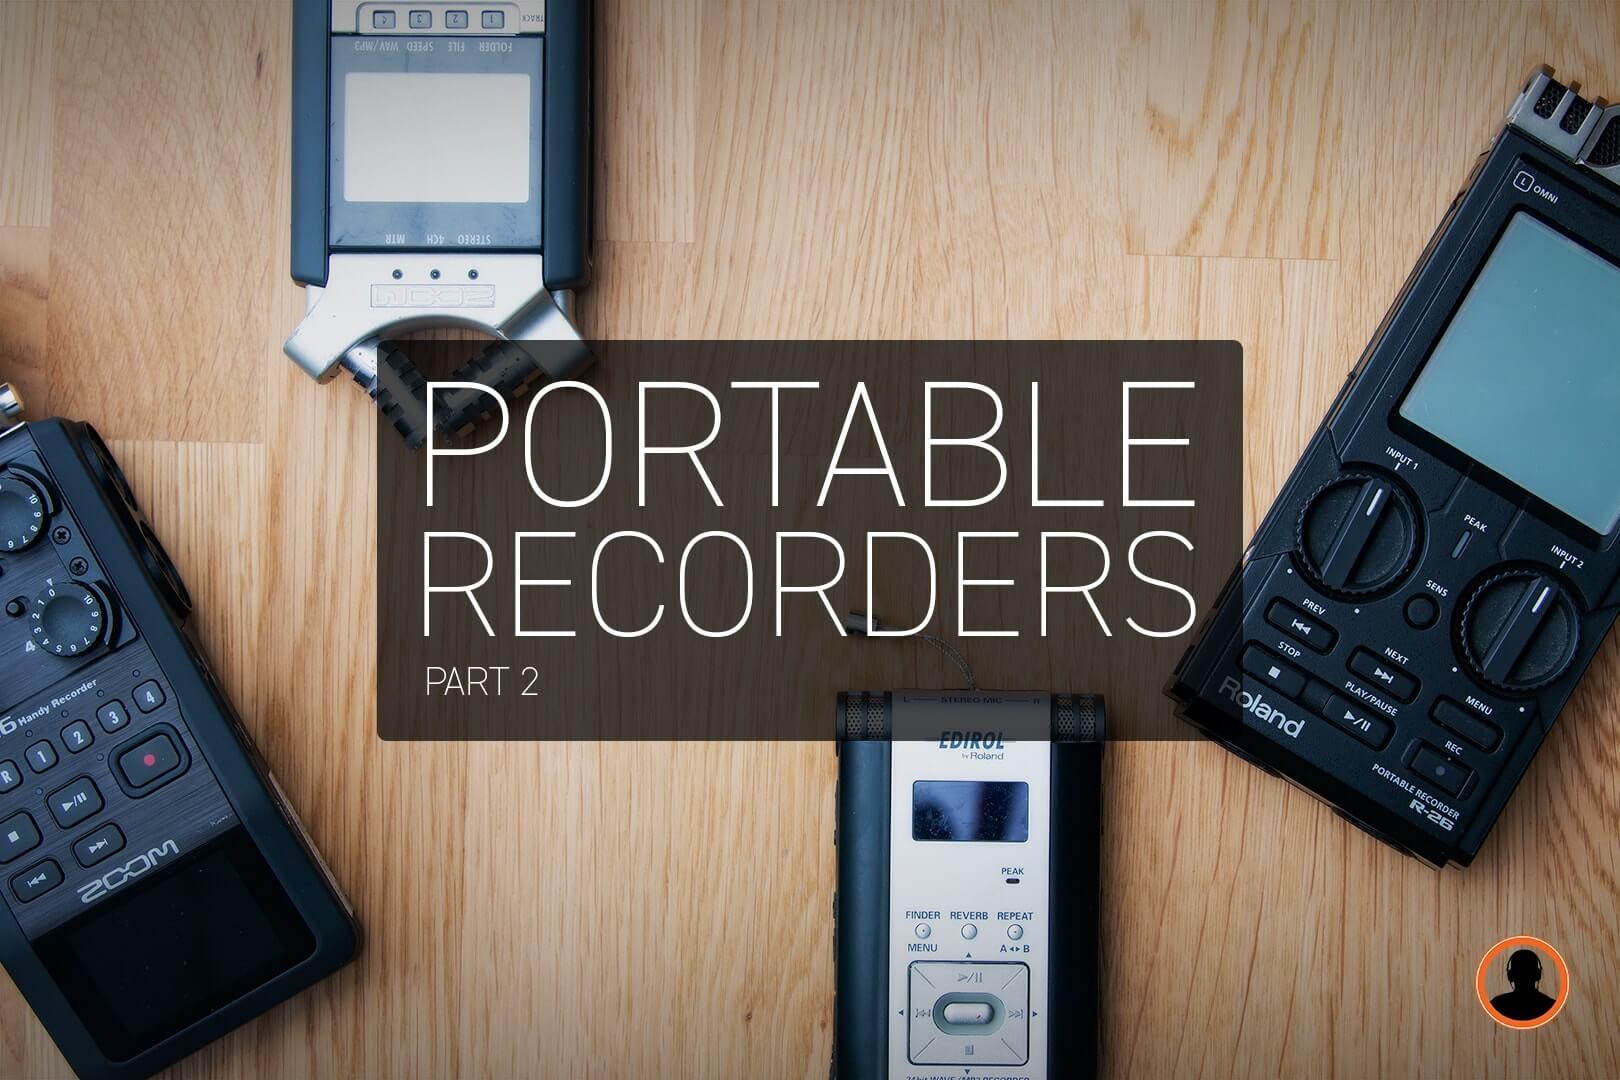 Portable Recorders (Part 2)